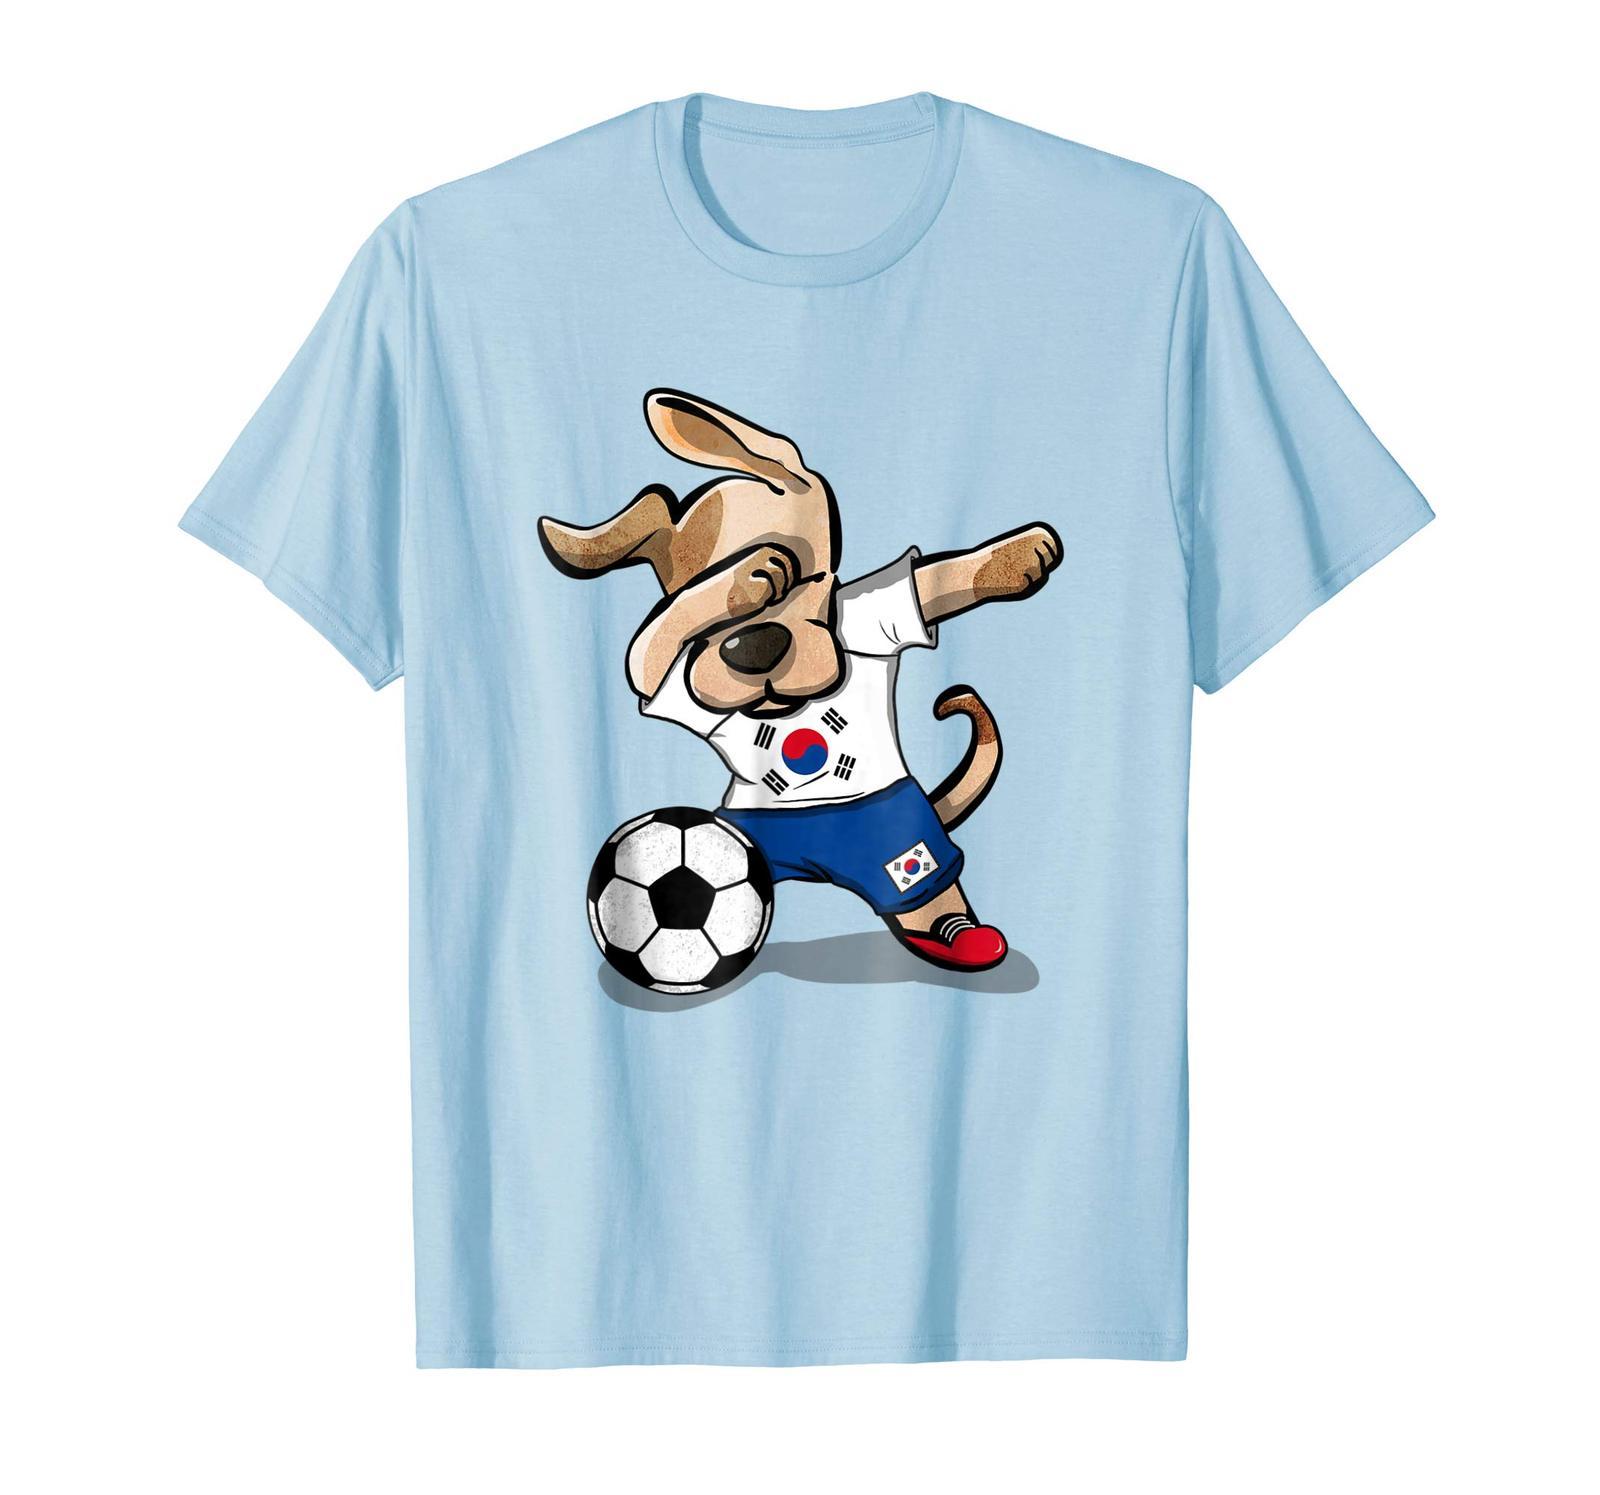 cc066d41900 New Shirts - Dog Dabbing Soccer South Korea and 50 similar items.  B1vjl6mug1s. cla 7c2140 2000 7c91kty0lwyql.png 7c0 0 2140 2000 0.0 0.0  2140.0 2000.0